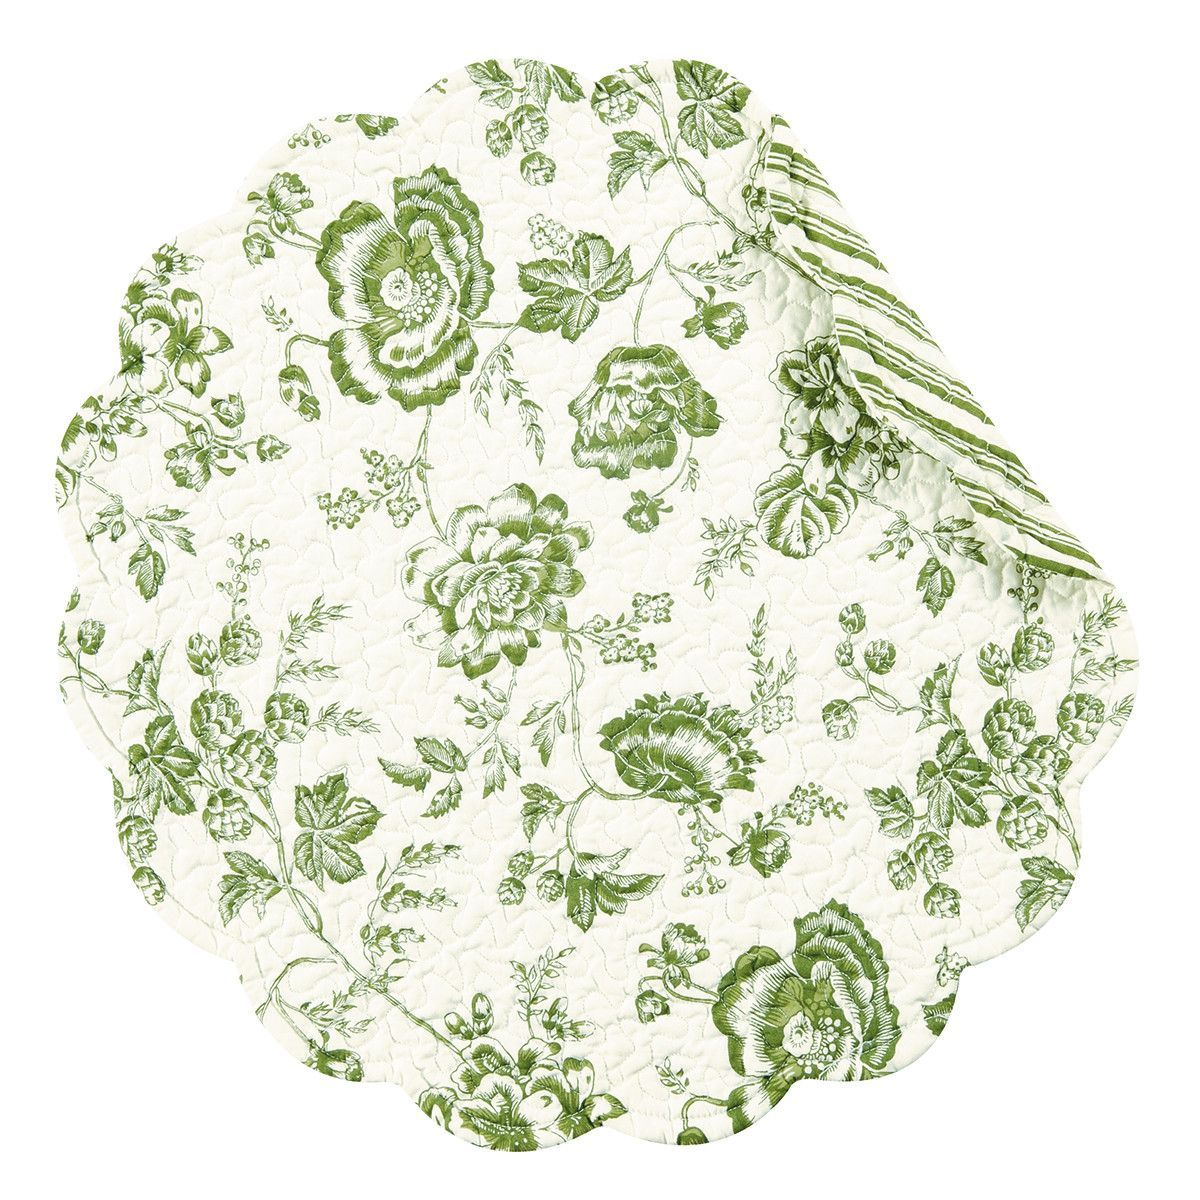 Devon Reversible Round Quilt Placemat Set Of 12 Placemats Placemat Sets Colorful Dishware